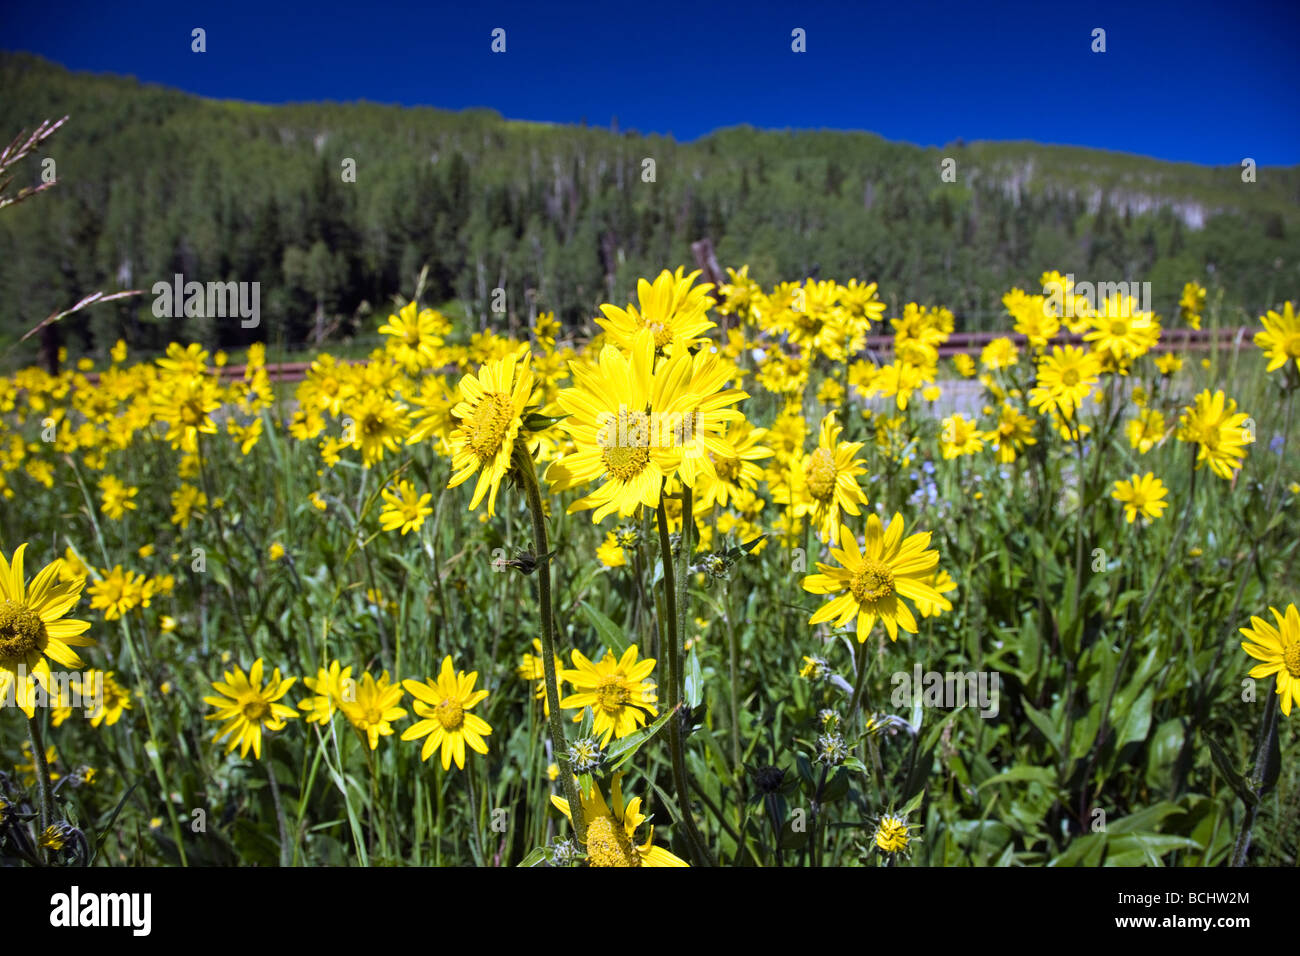 Mules Ear Aspen Sunflowers below Snodgrass Mountain near Washington Gulch Mount Crested Butte Colorado USA - Stock Image